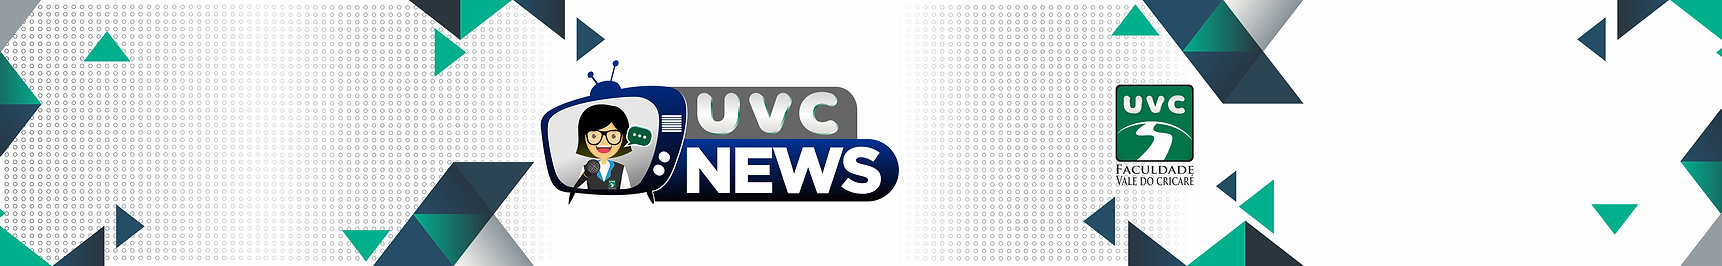 capa uvc news.jpg